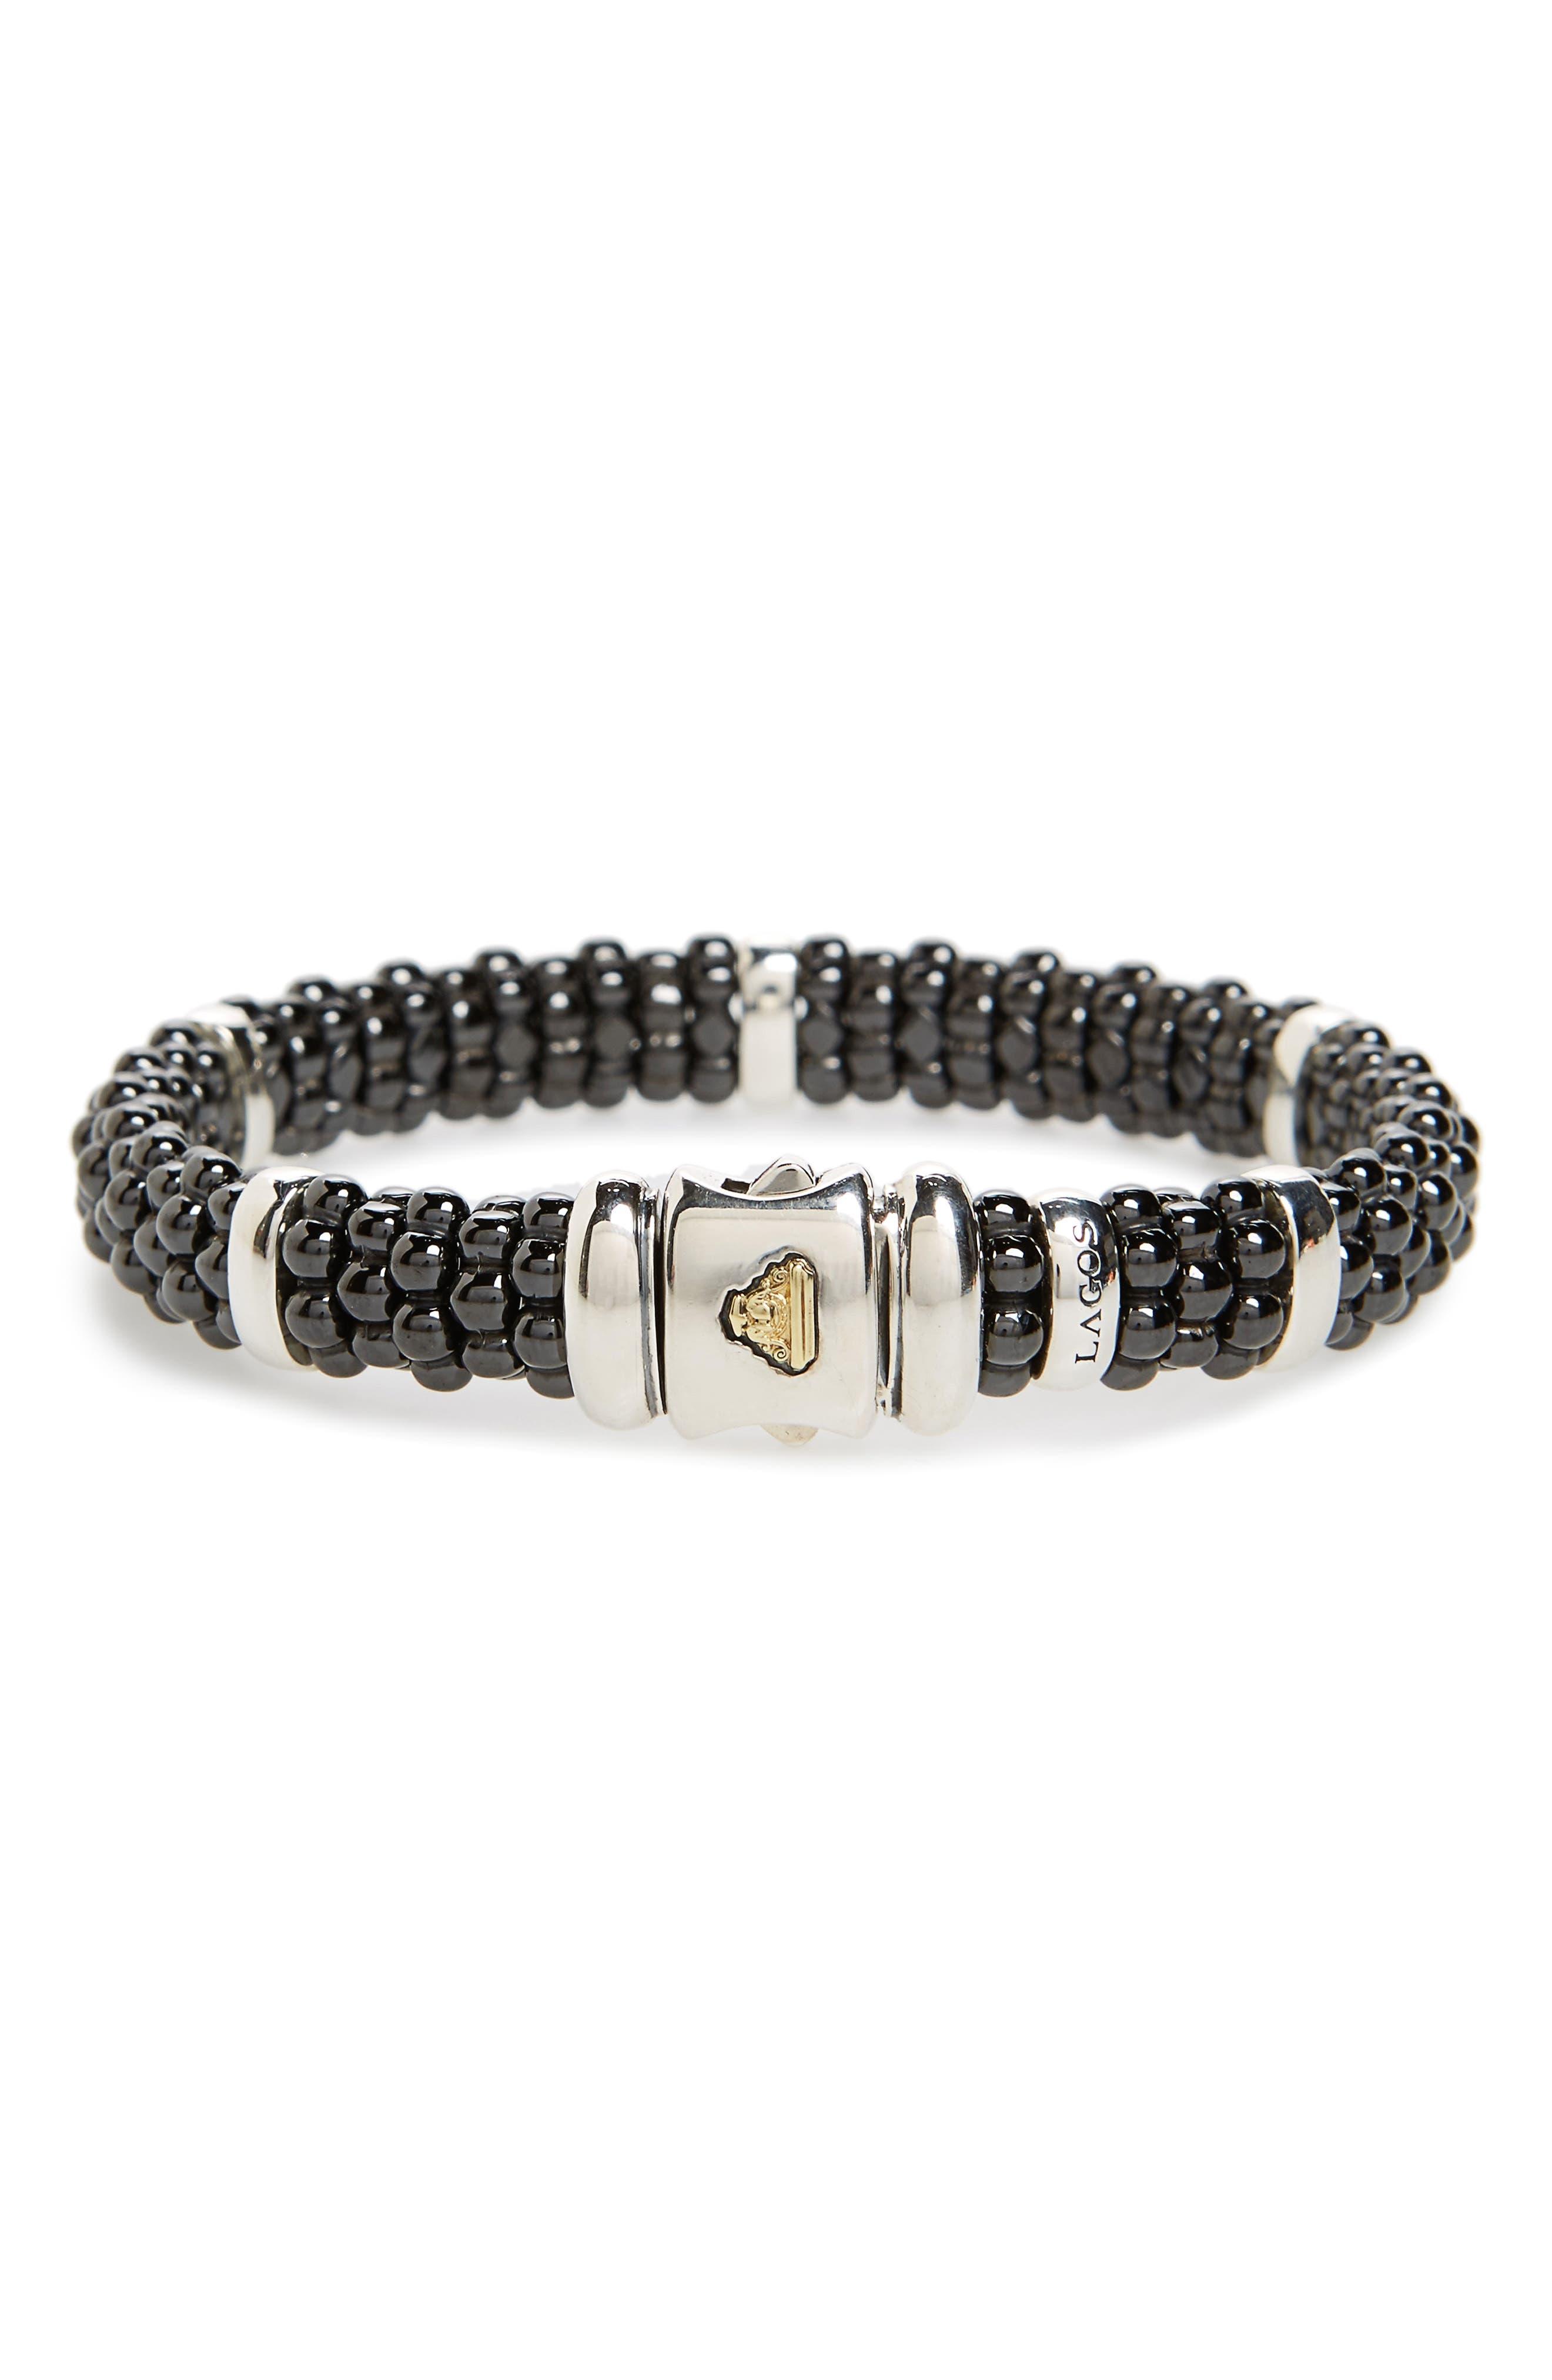 Black Caviar Station Bracelet,                             Main thumbnail 1, color,                             BLACK/ SILVER/ GOLD